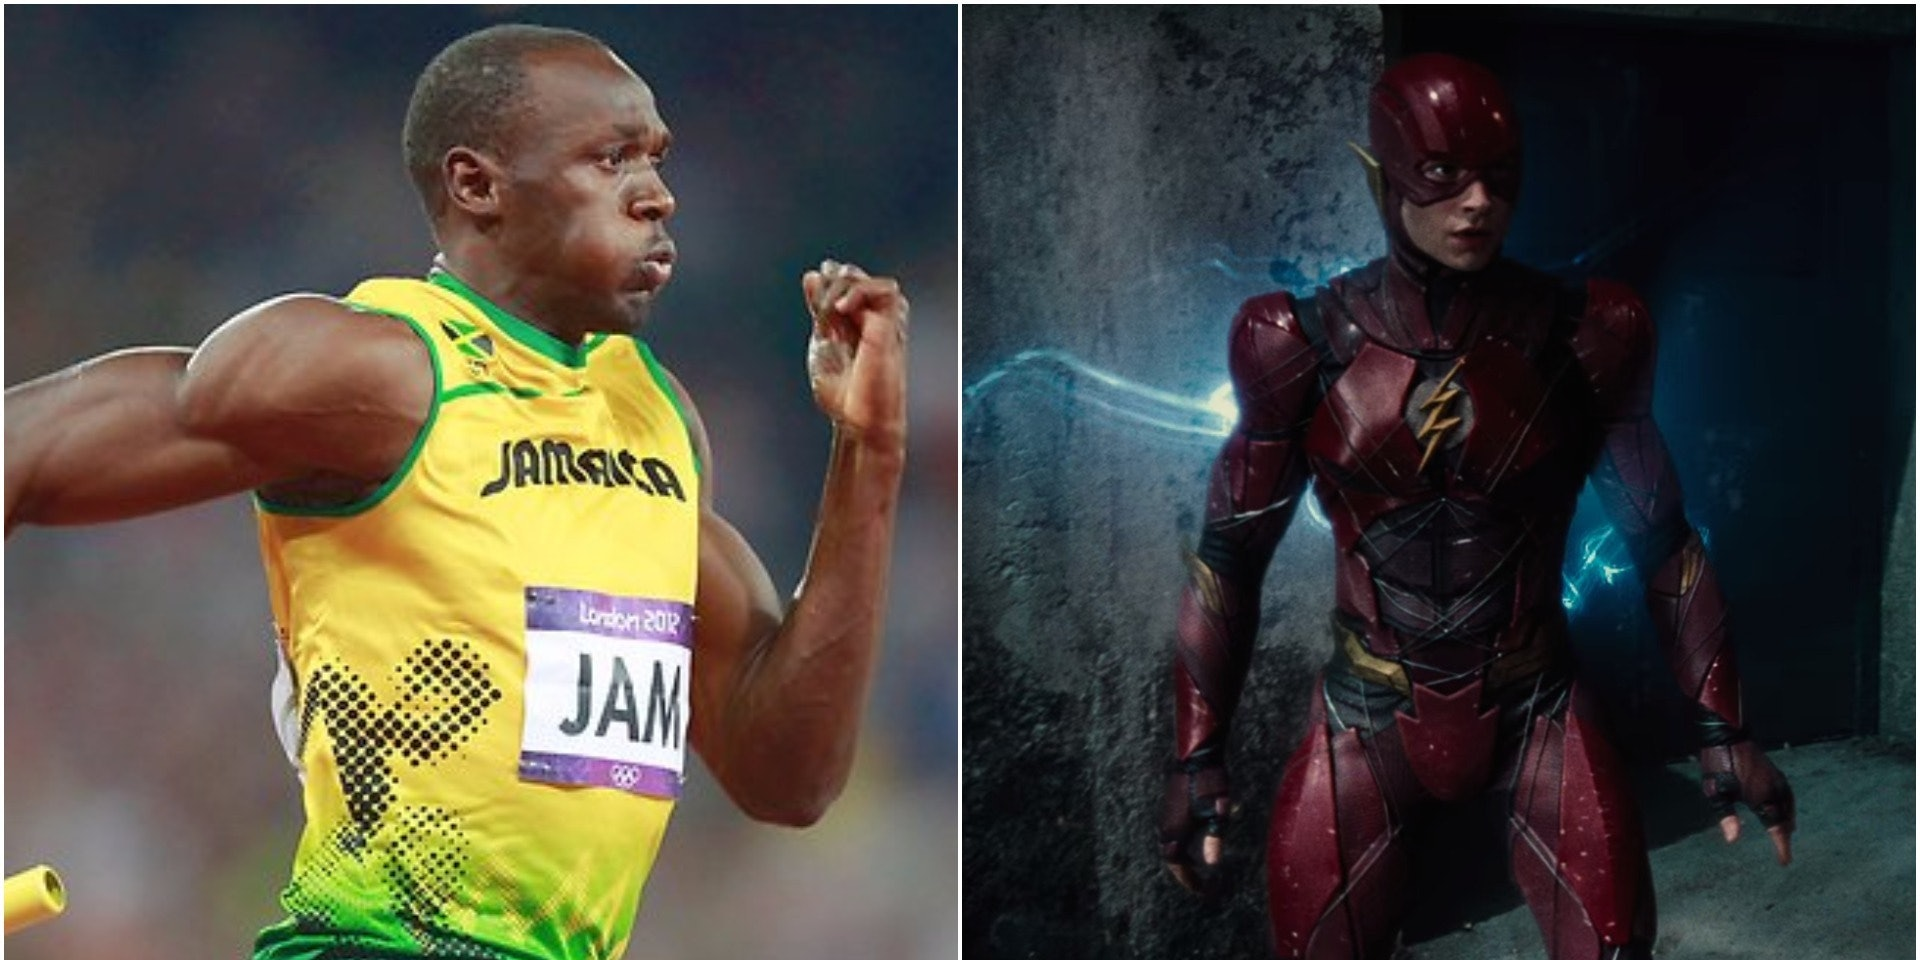 Ezra Miller as The Flash and Usain Bolt